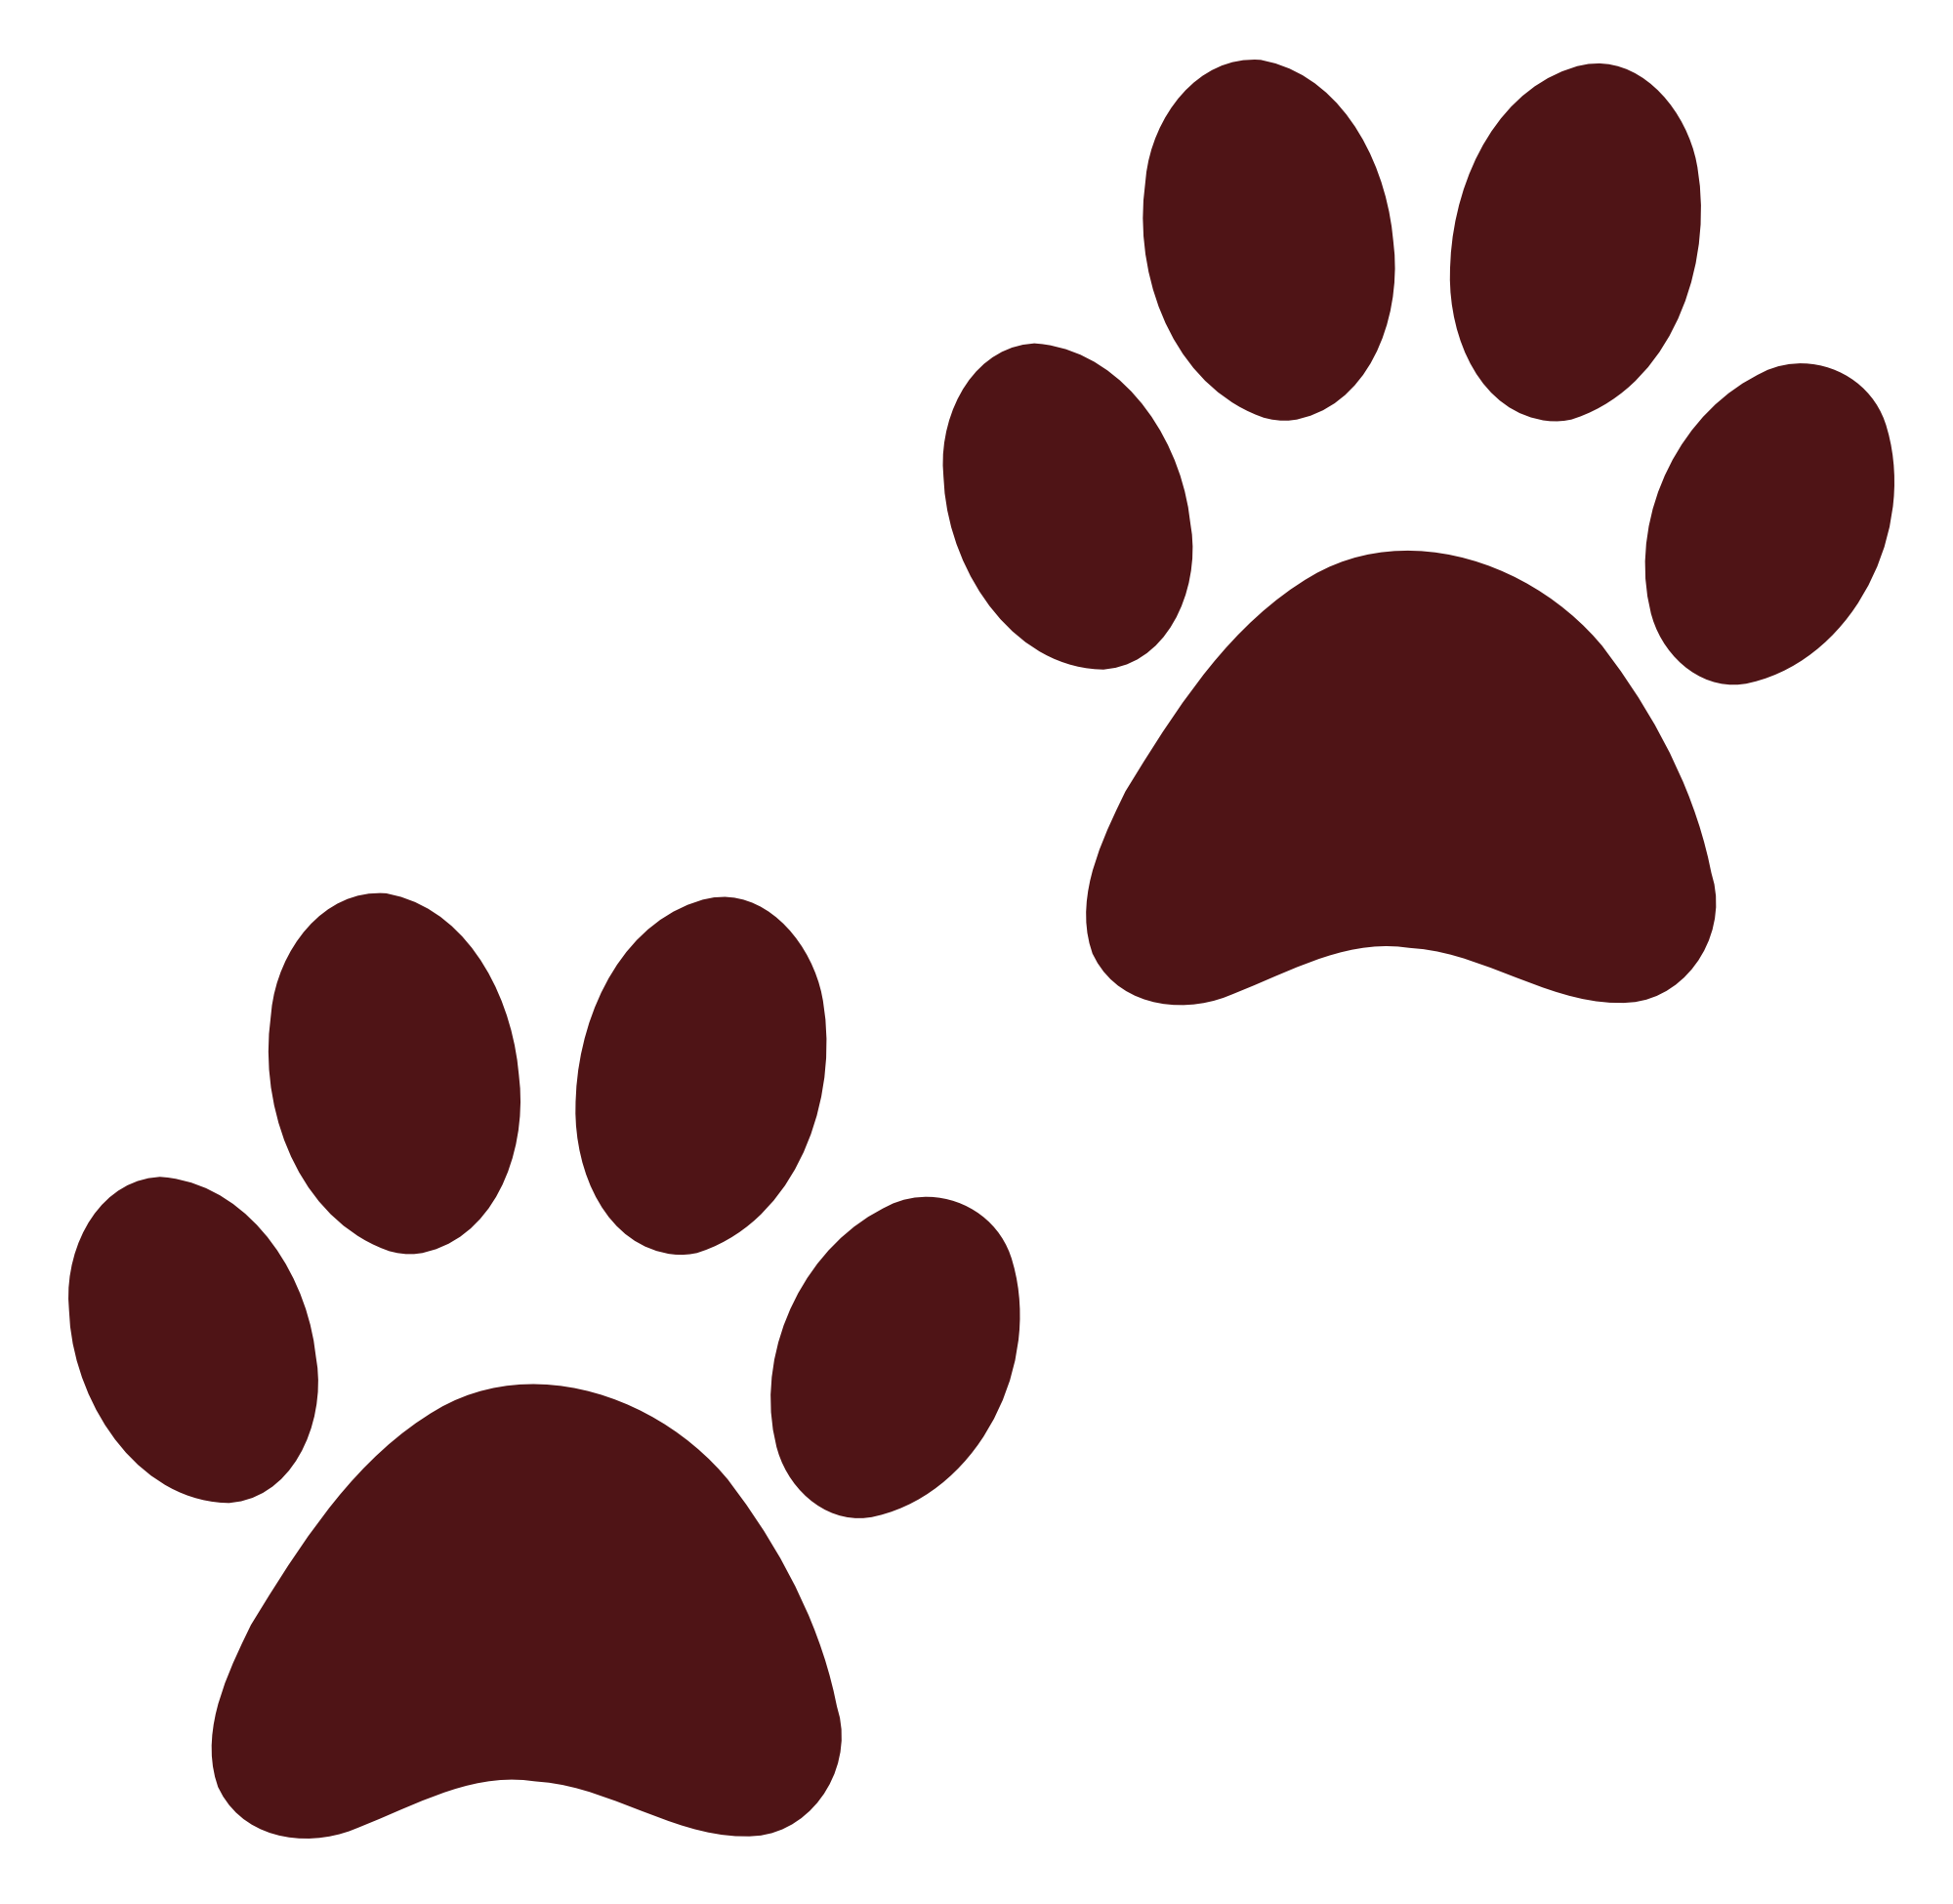 Aniaml pawprints clipart transparent png transparent stock Free Cat Paw Prints Transparent, Download Free Clip Art, Free Clip ... png transparent stock